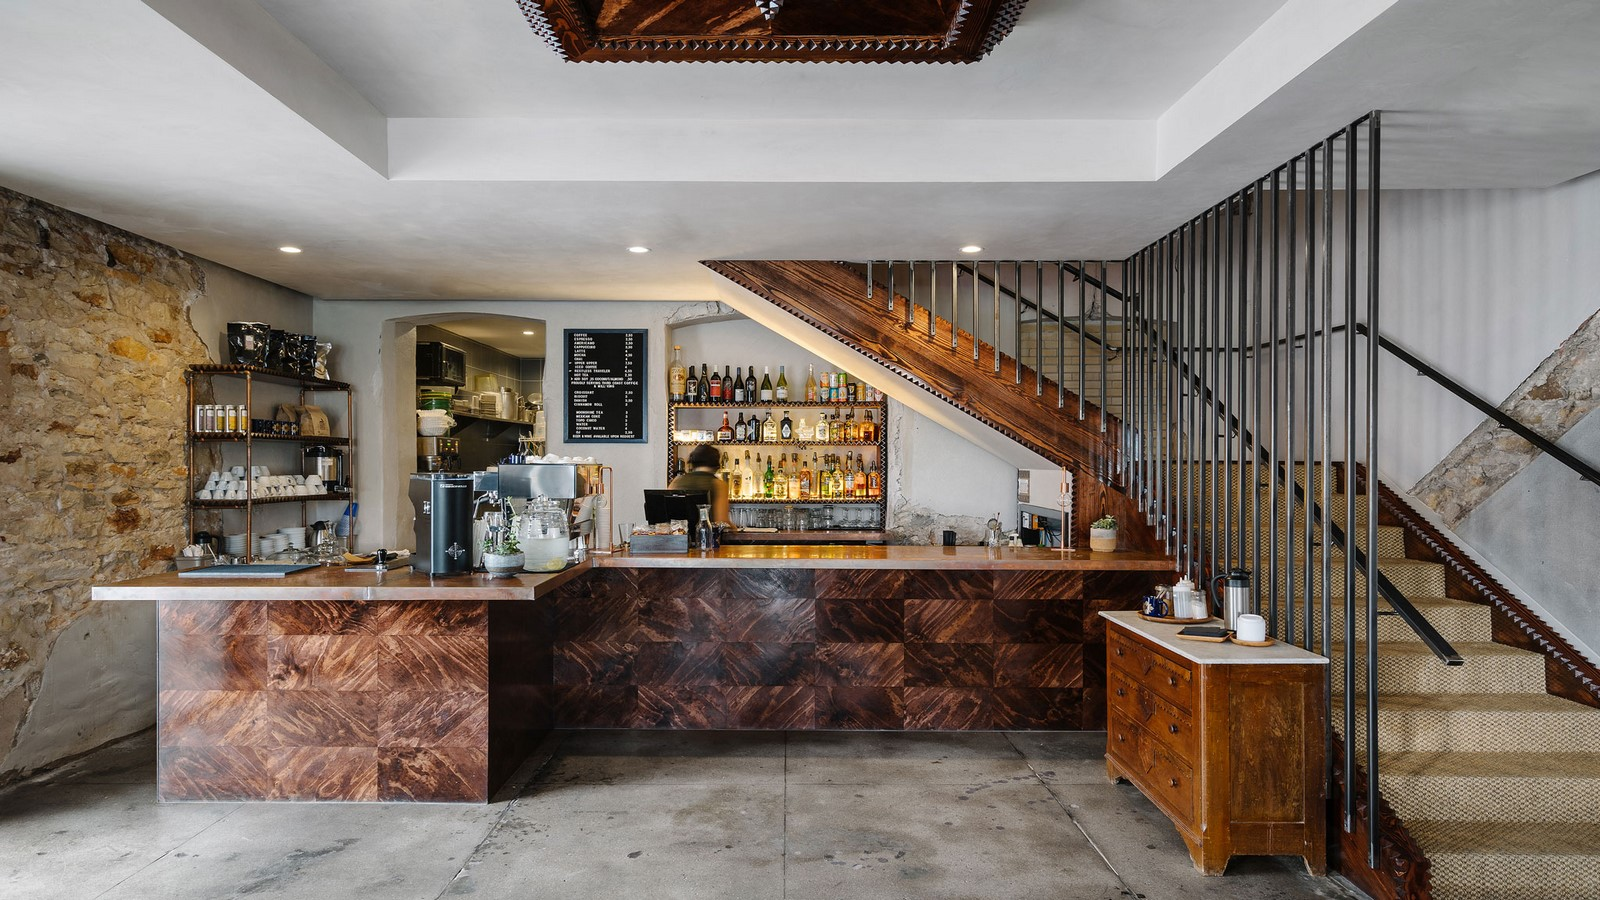 Native Hostel, Bar & Kitchen by Black Rabbit - Sheet2